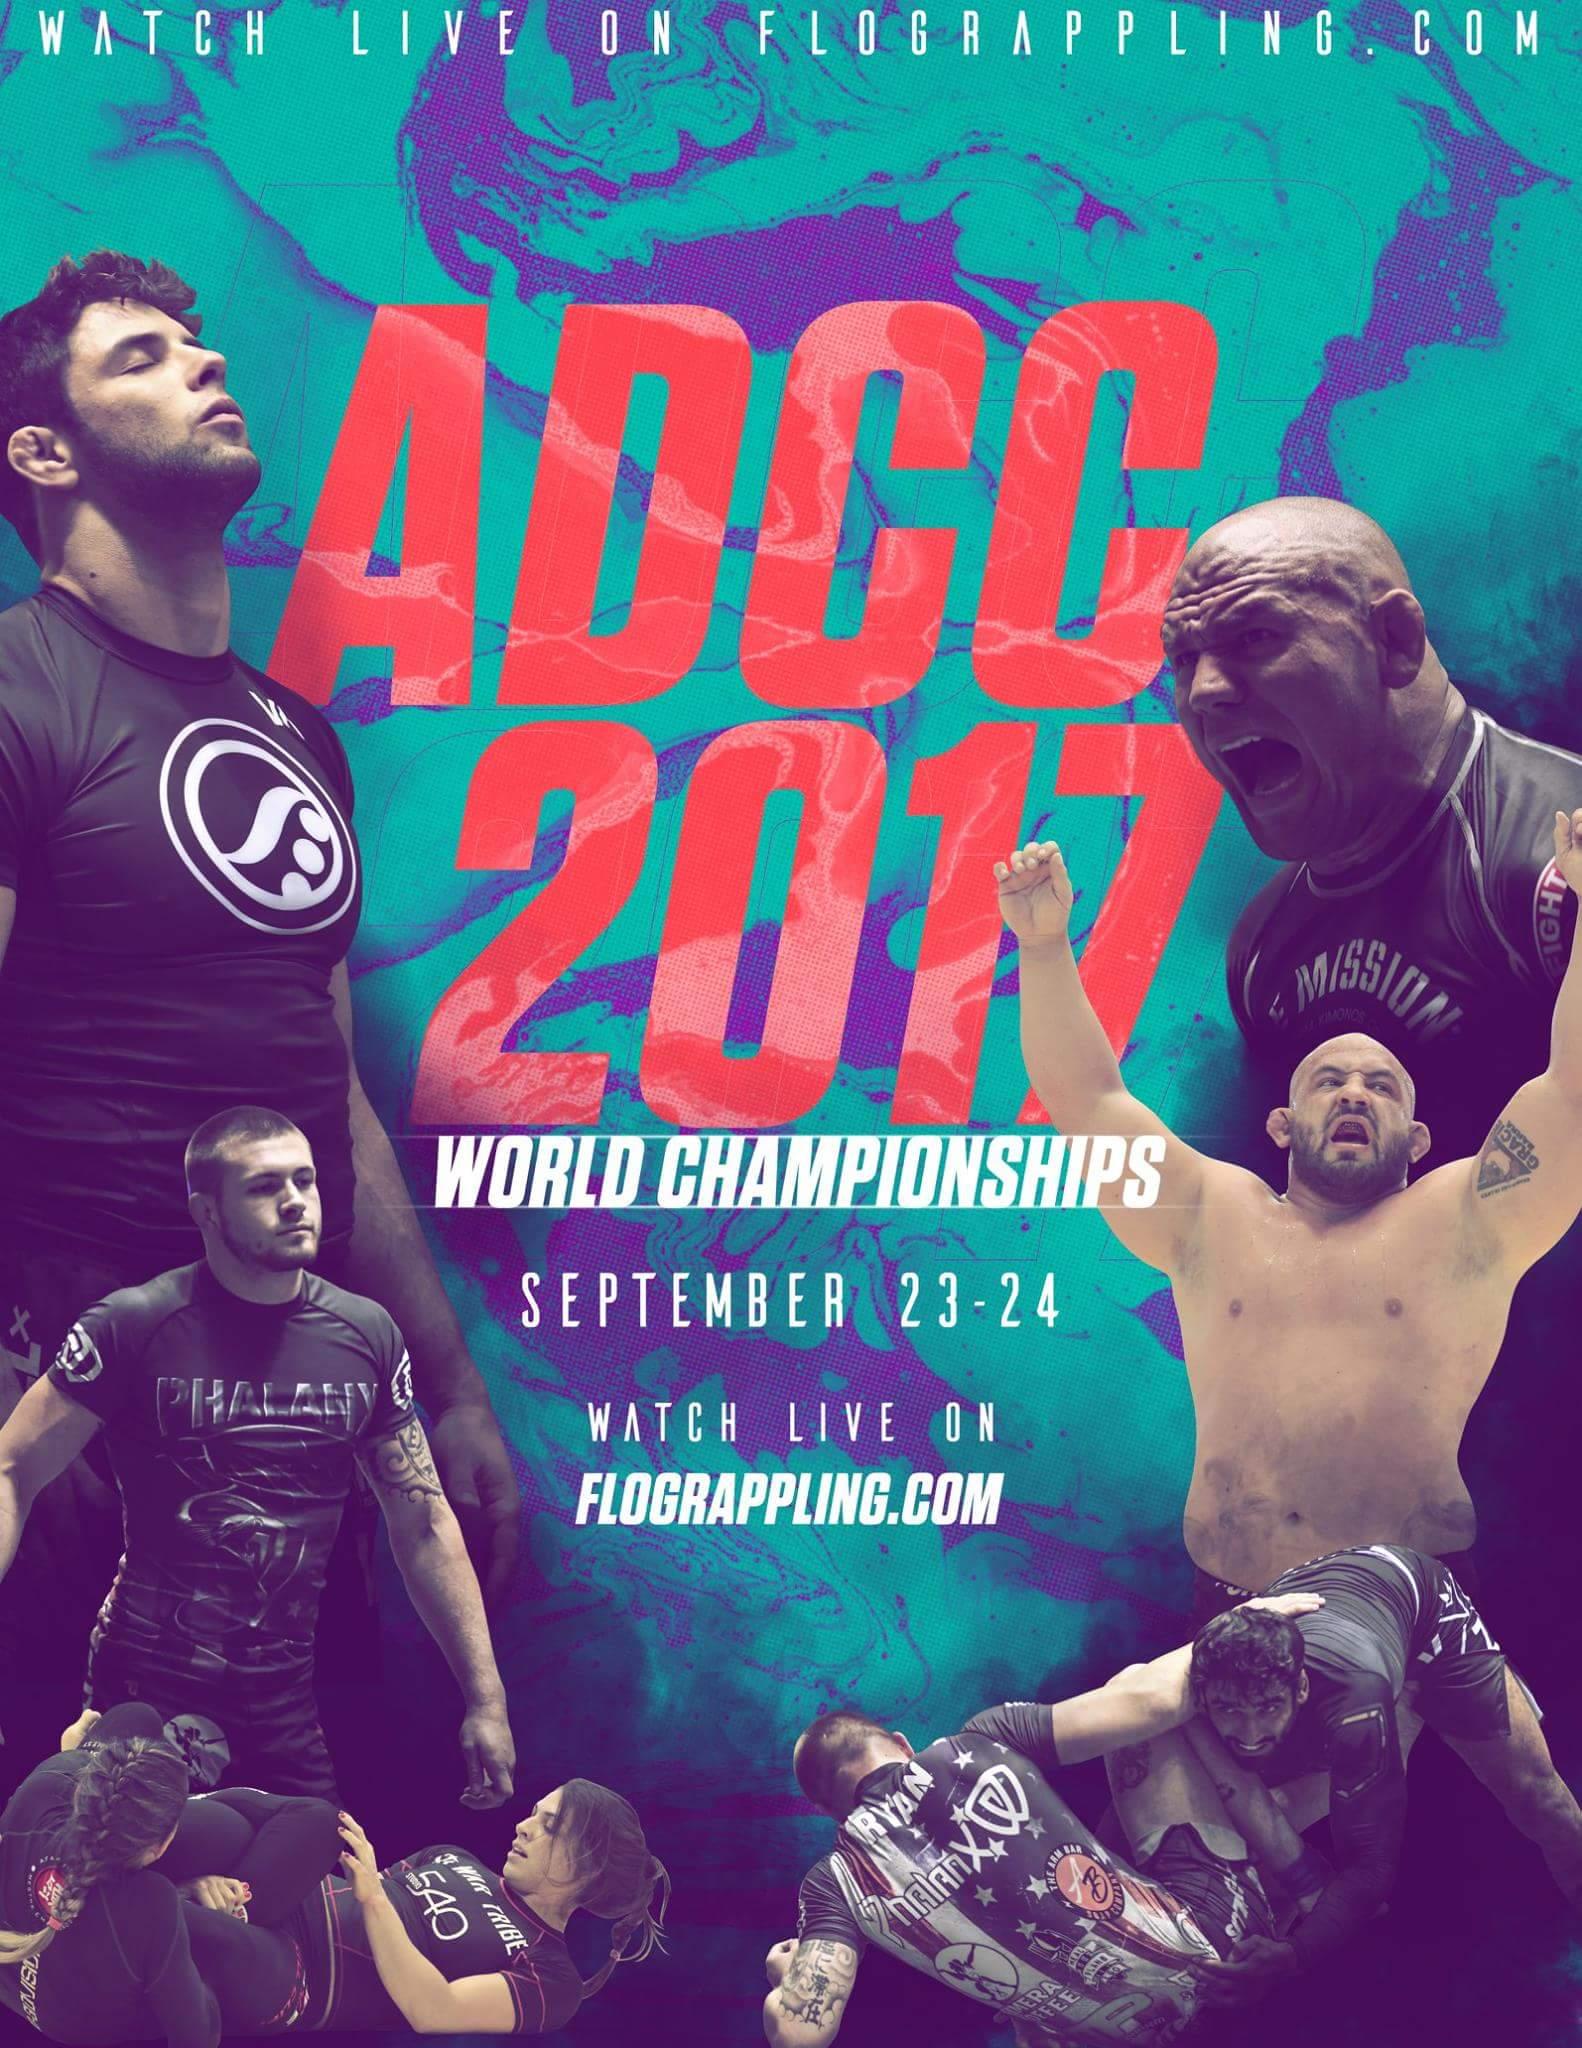 ADCC World Championships